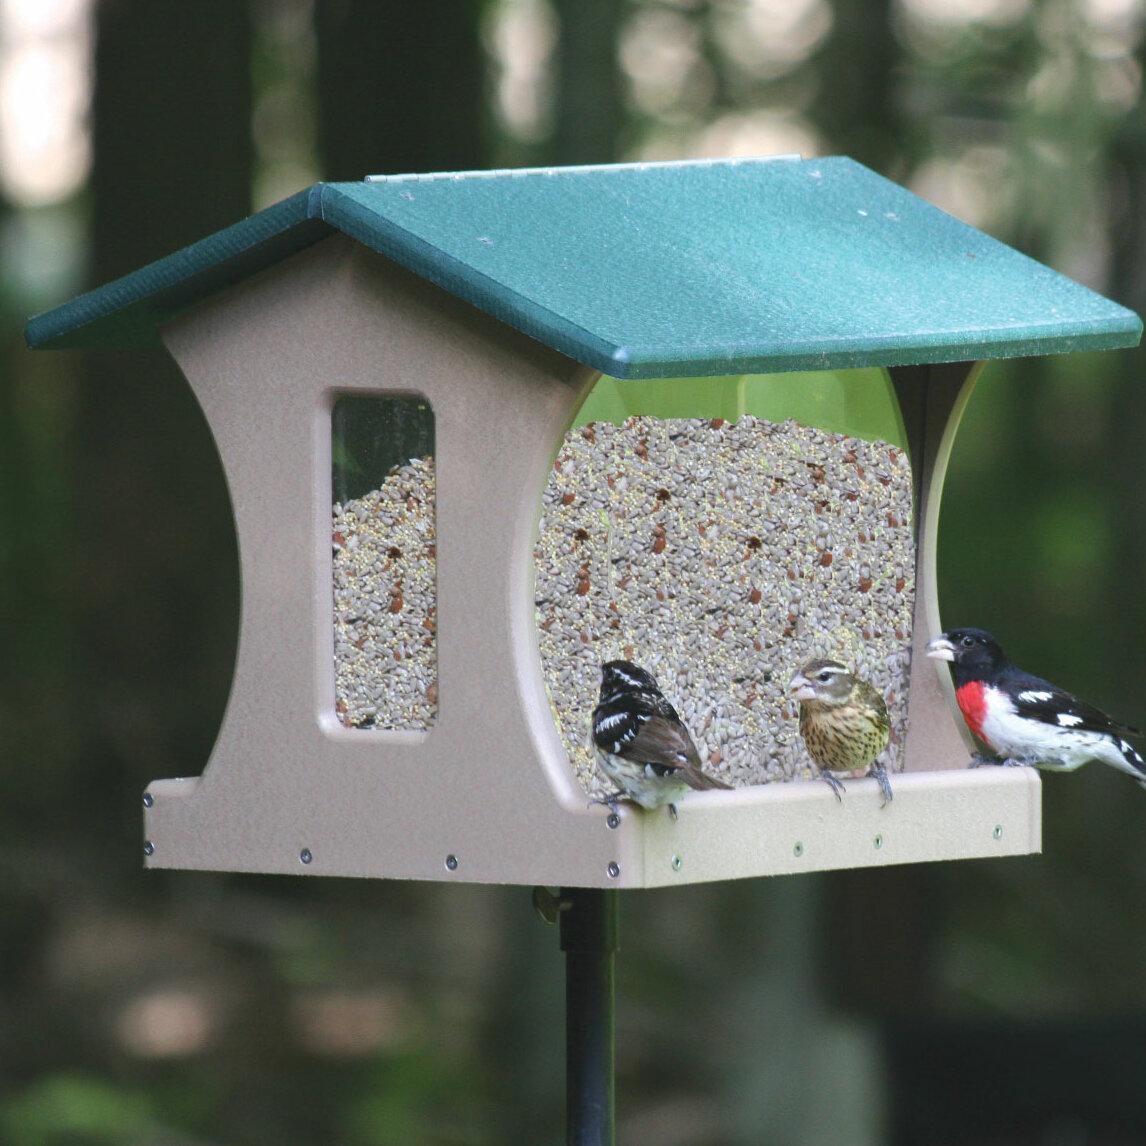 Birds Choice 4 Gallon Recycled Hopper Bird Feeder   Wayfair